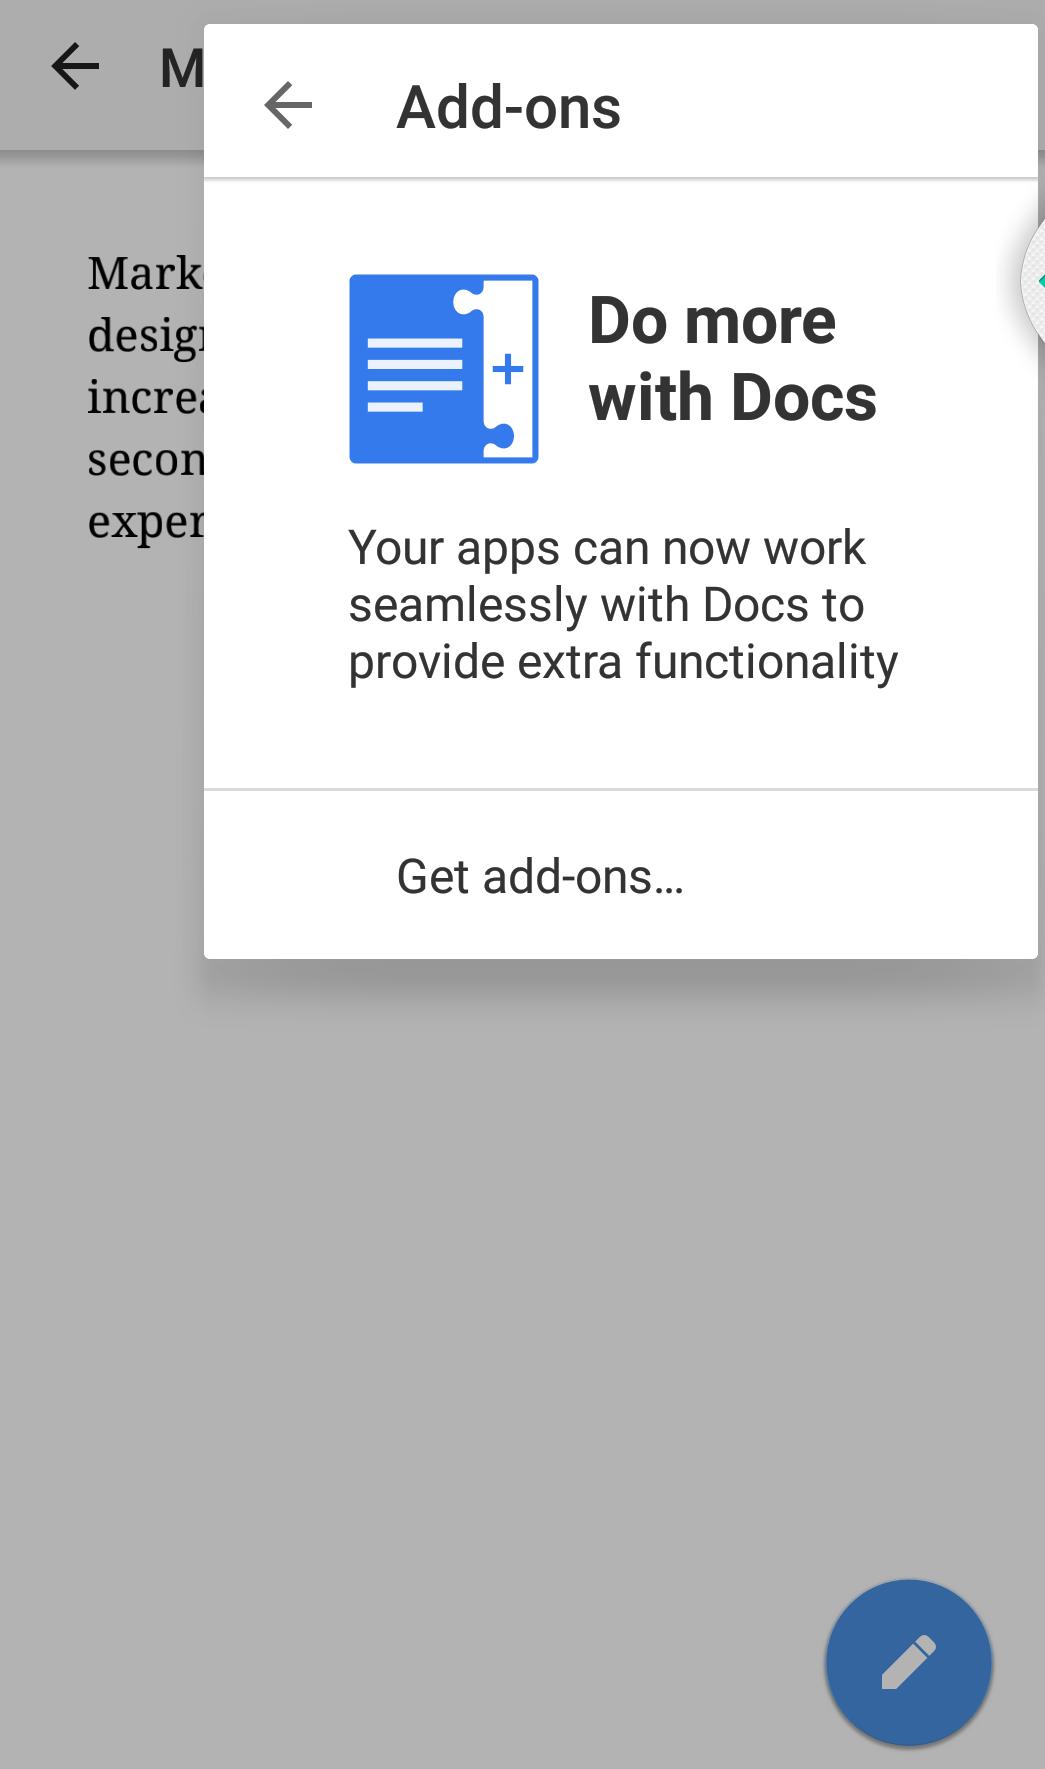 Google docs mobile app add-ons